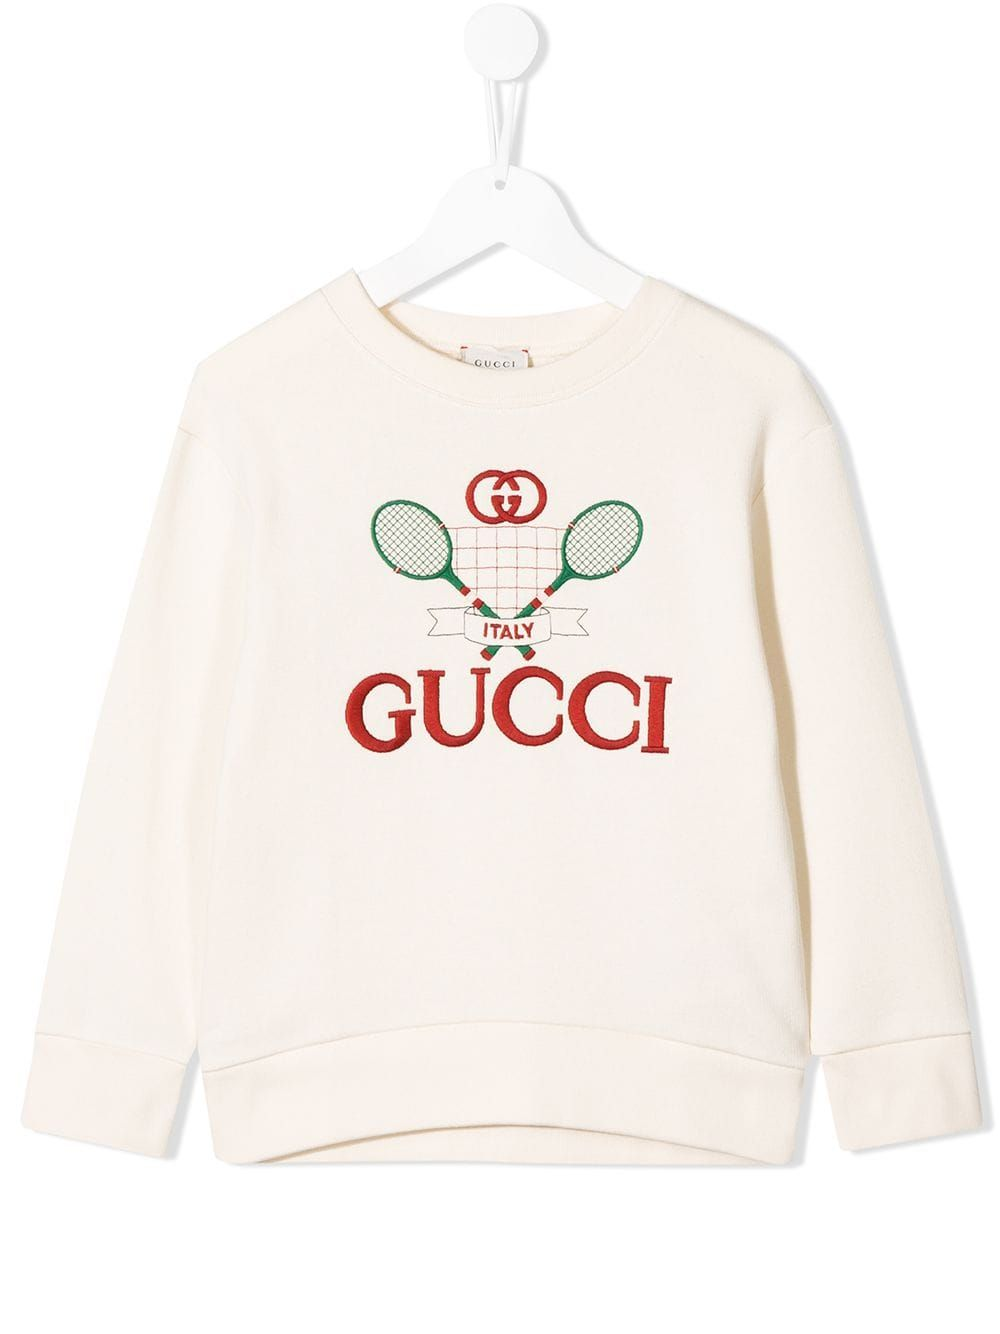 Gucci Kids Gucci Tennis Sweatshirt Farfetch Gucci Kids Sweatshirts Badminton Logo [ 1334 x 1000 Pixel ]